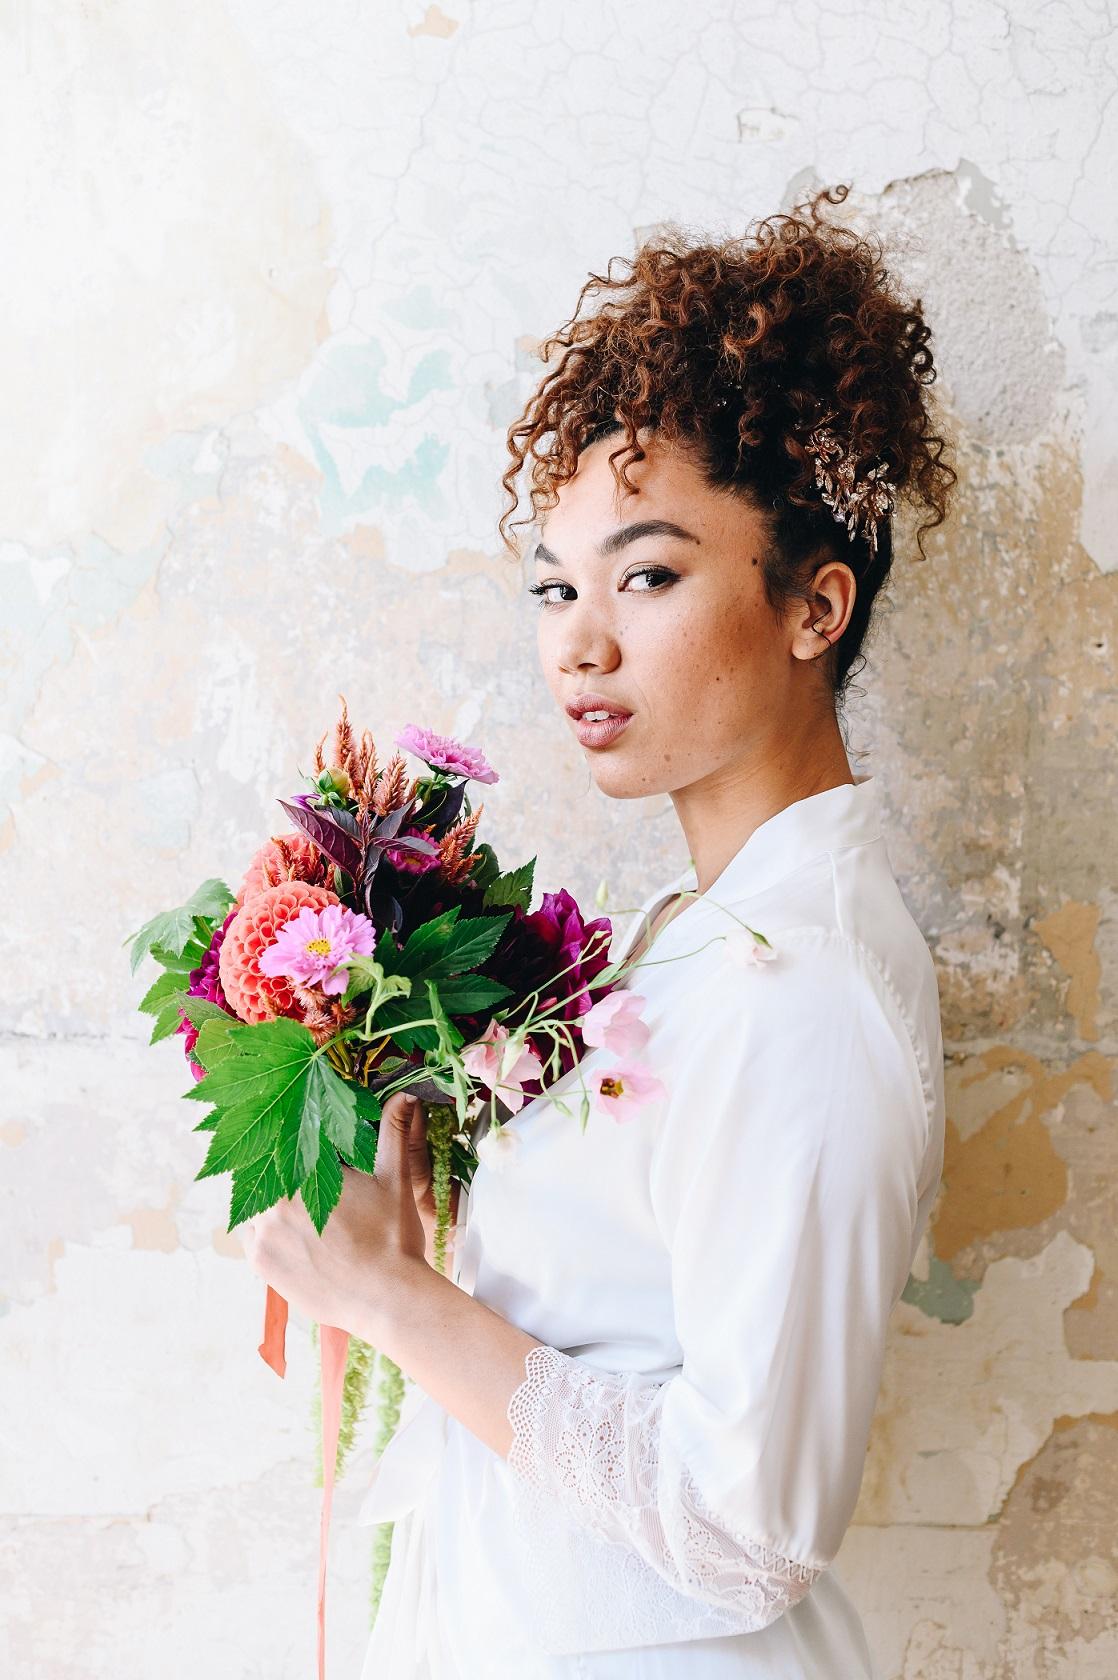 Wedding Hairstyles For Naturally Curly Hair David S Bridal Blog